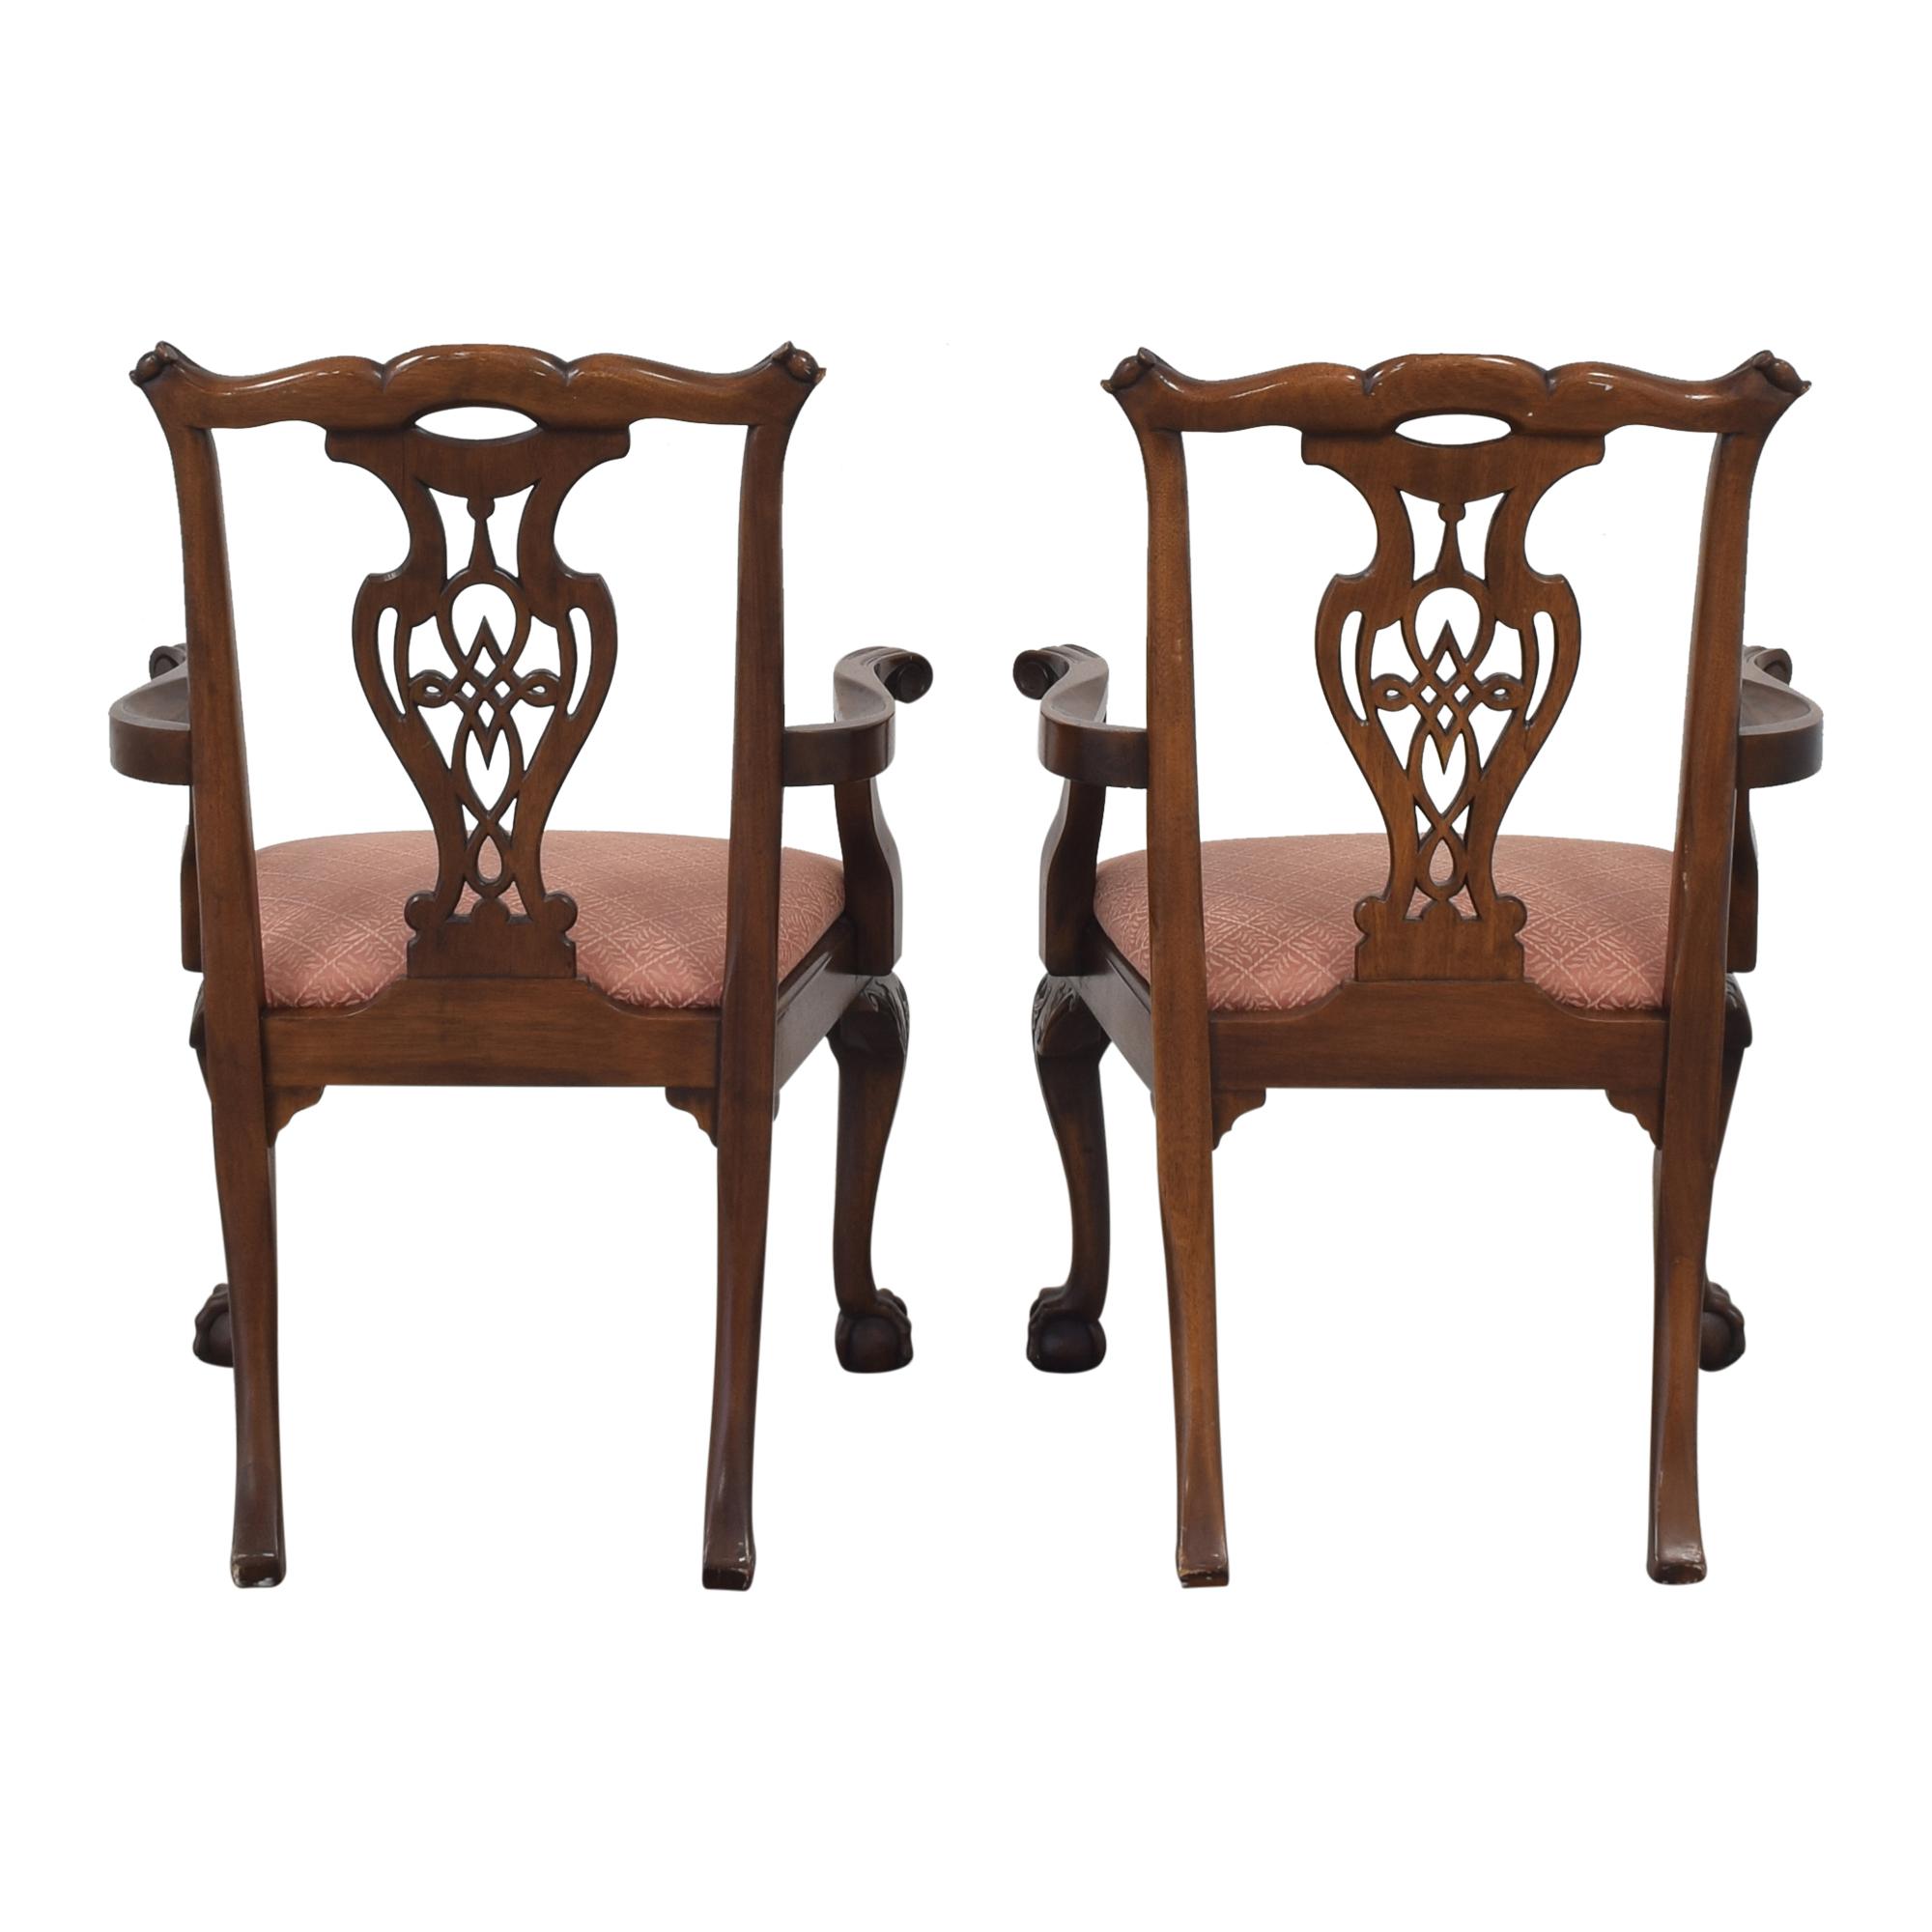 Henredon Heirloom Dining Chairs Henredon Furniture